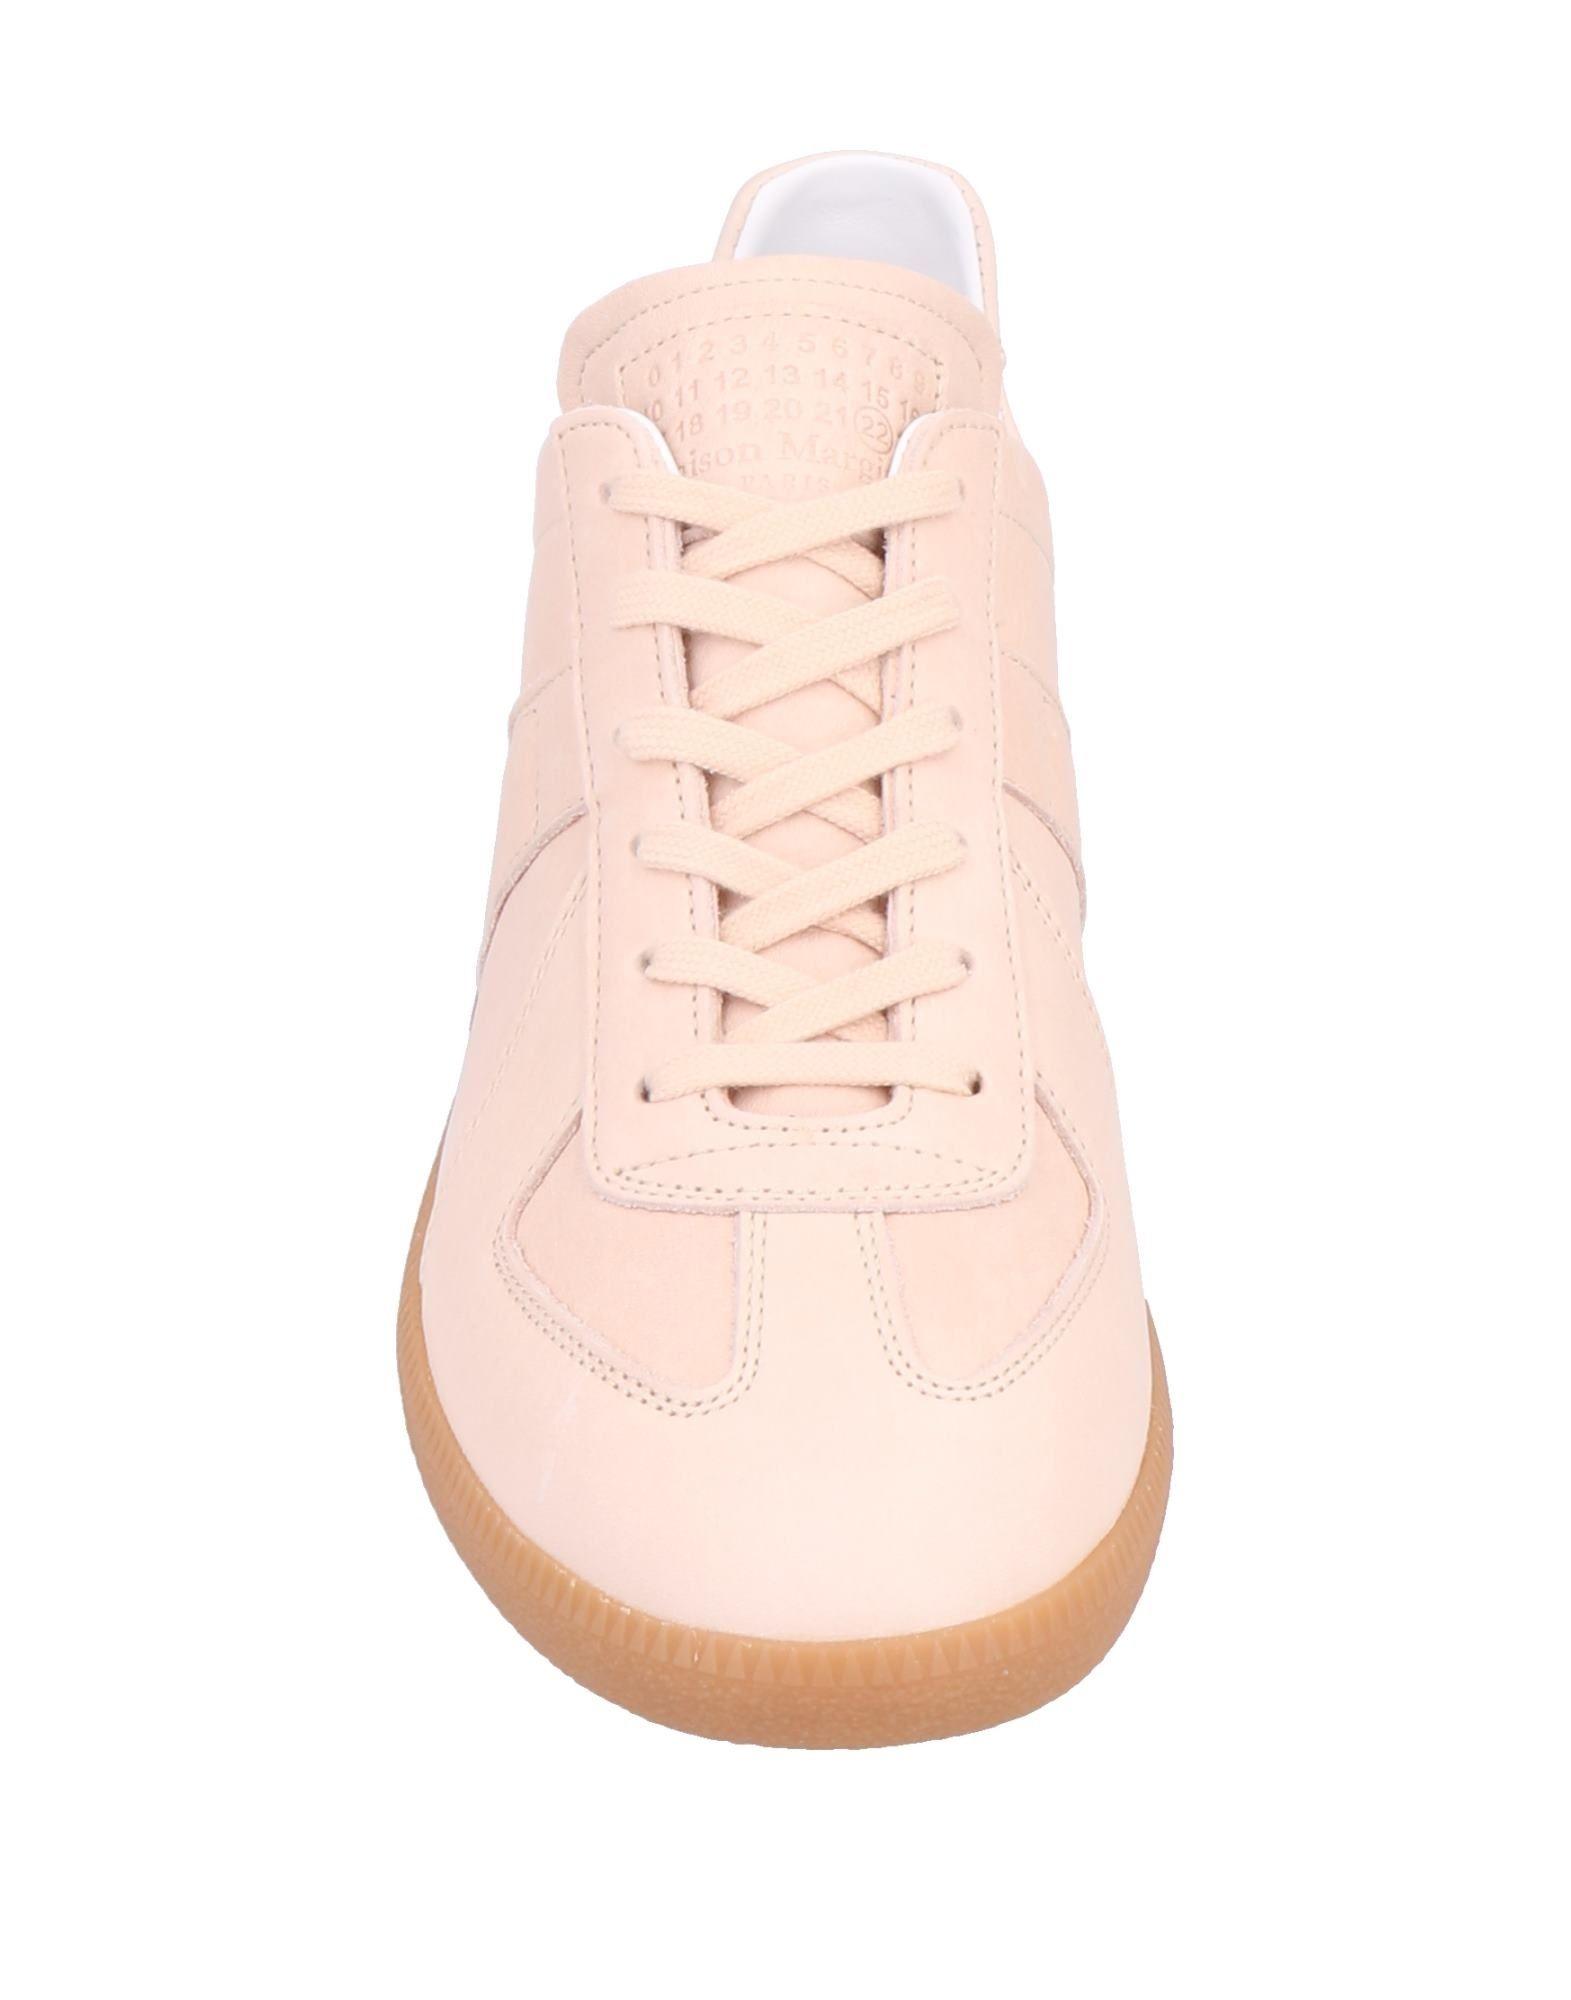 Maison Margiela Sneakers - Men Maison Margiela Sneakers online 11568392PP on  Canada - 11568392PP online 5431e8